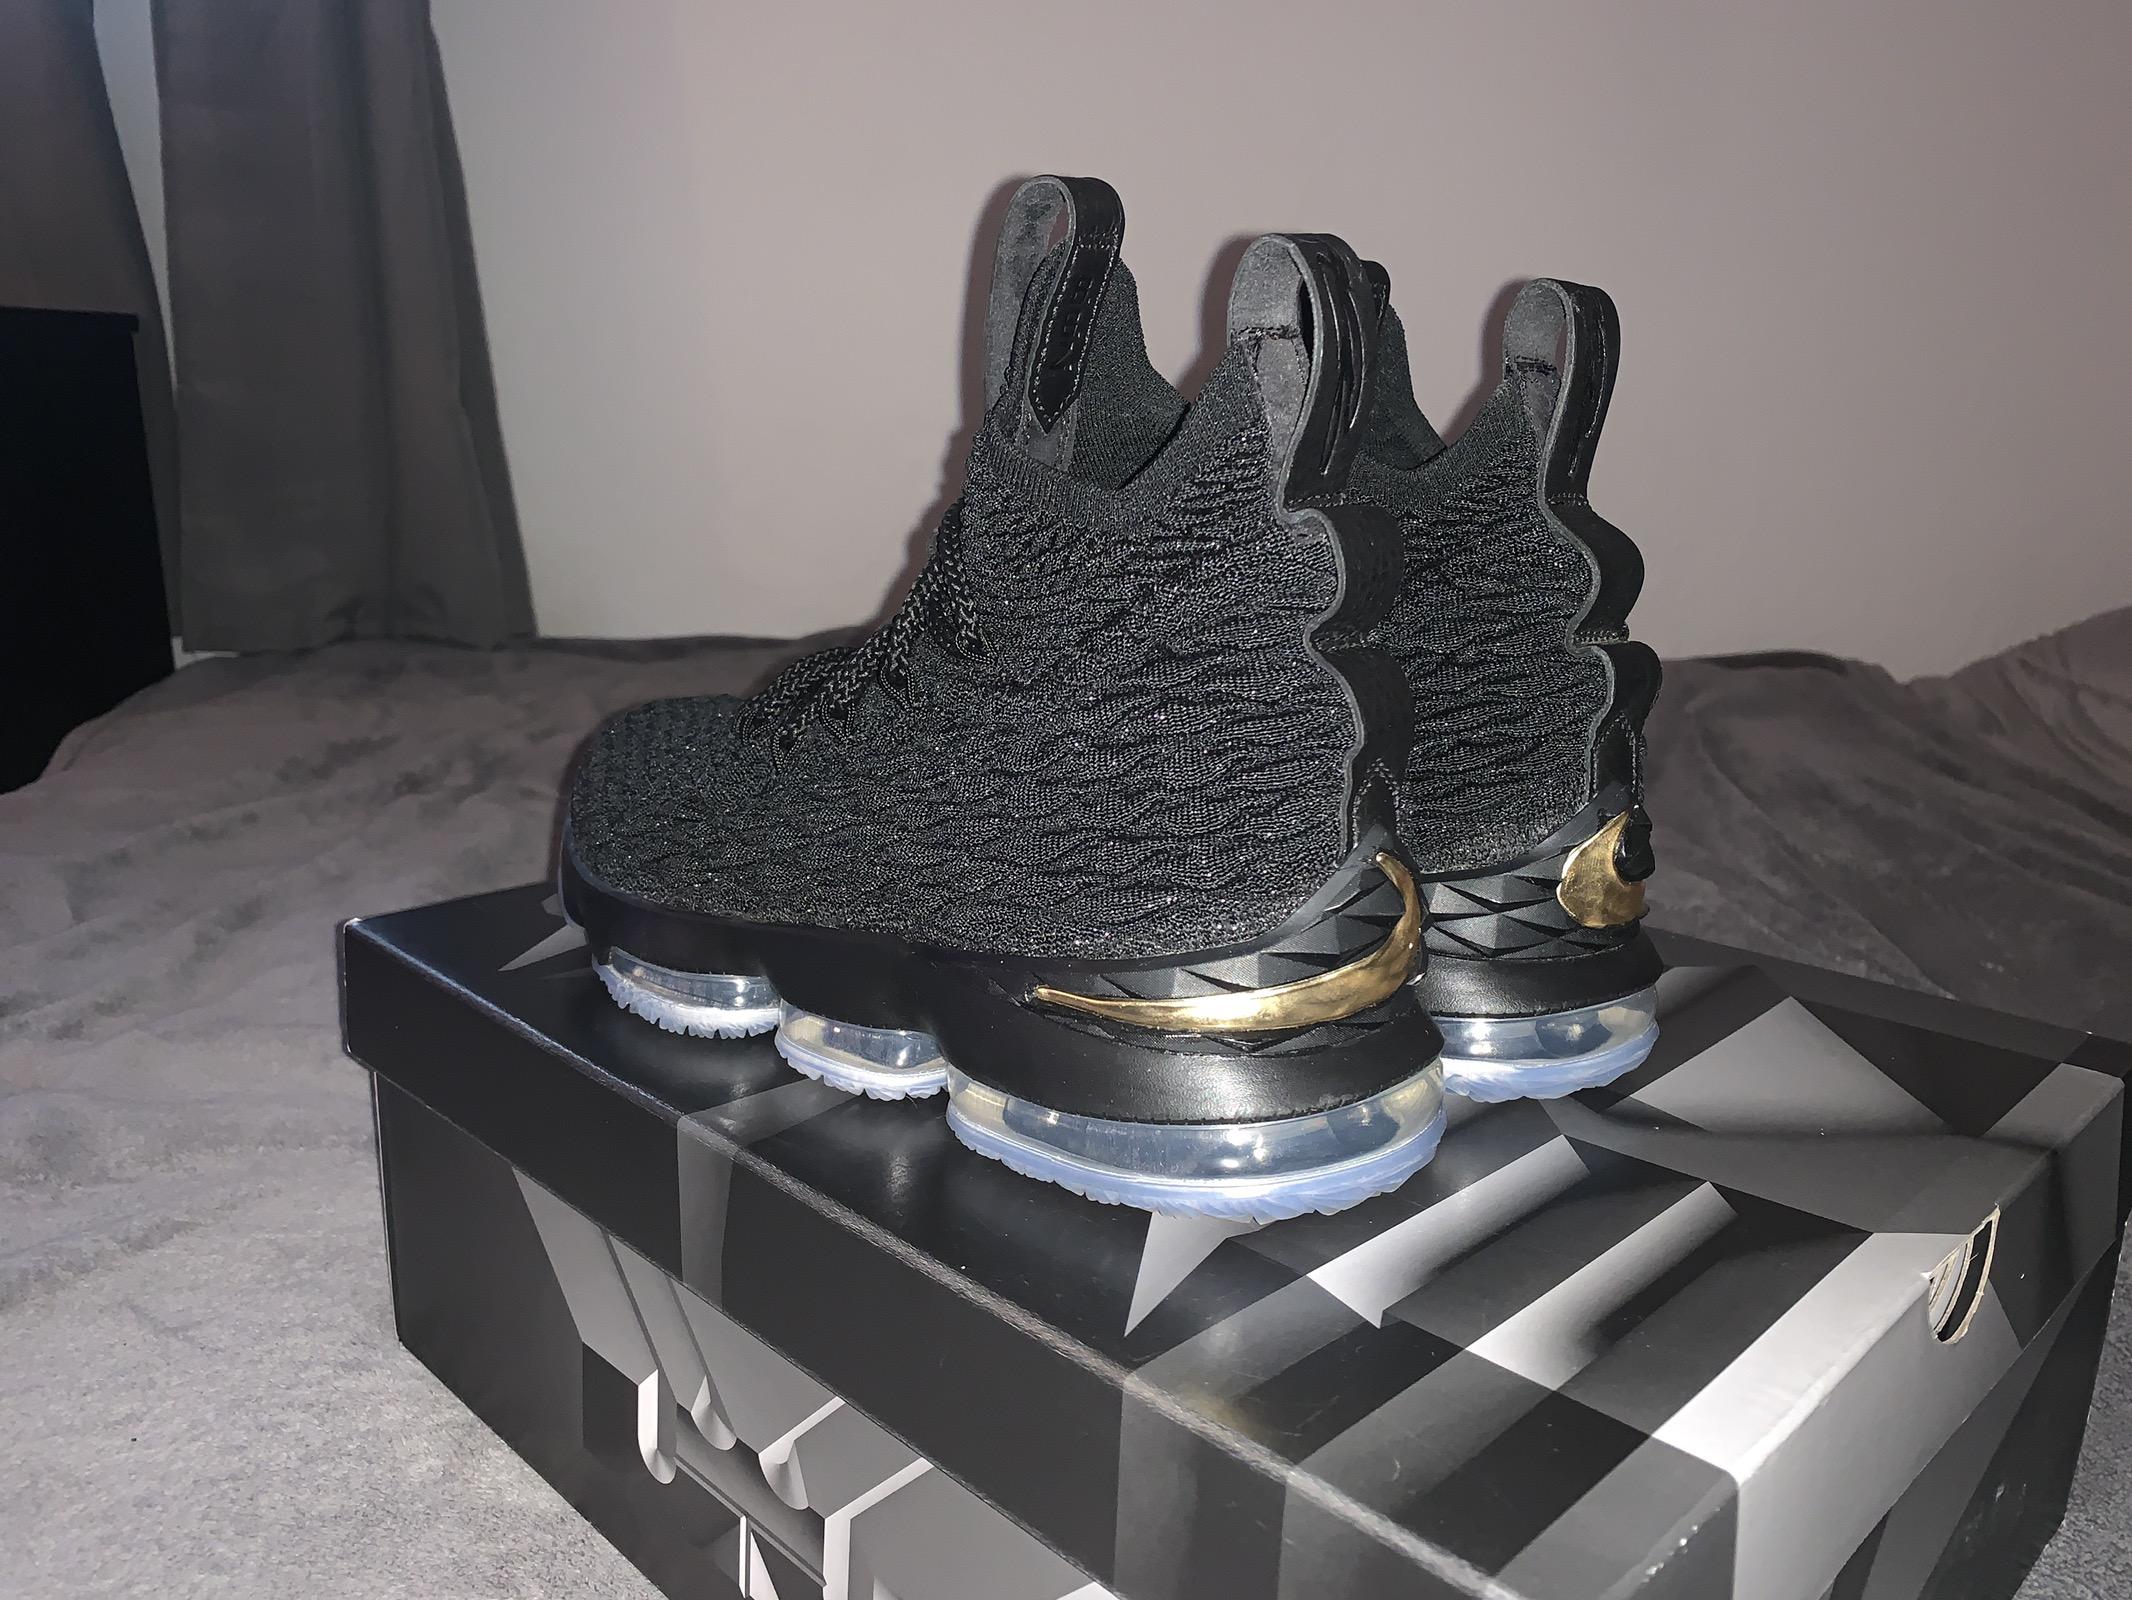 da2599a94f9 Nike LeBron 15 Black  Gold Size 11 - Hi-Top Sneakers for Sale - Grailed